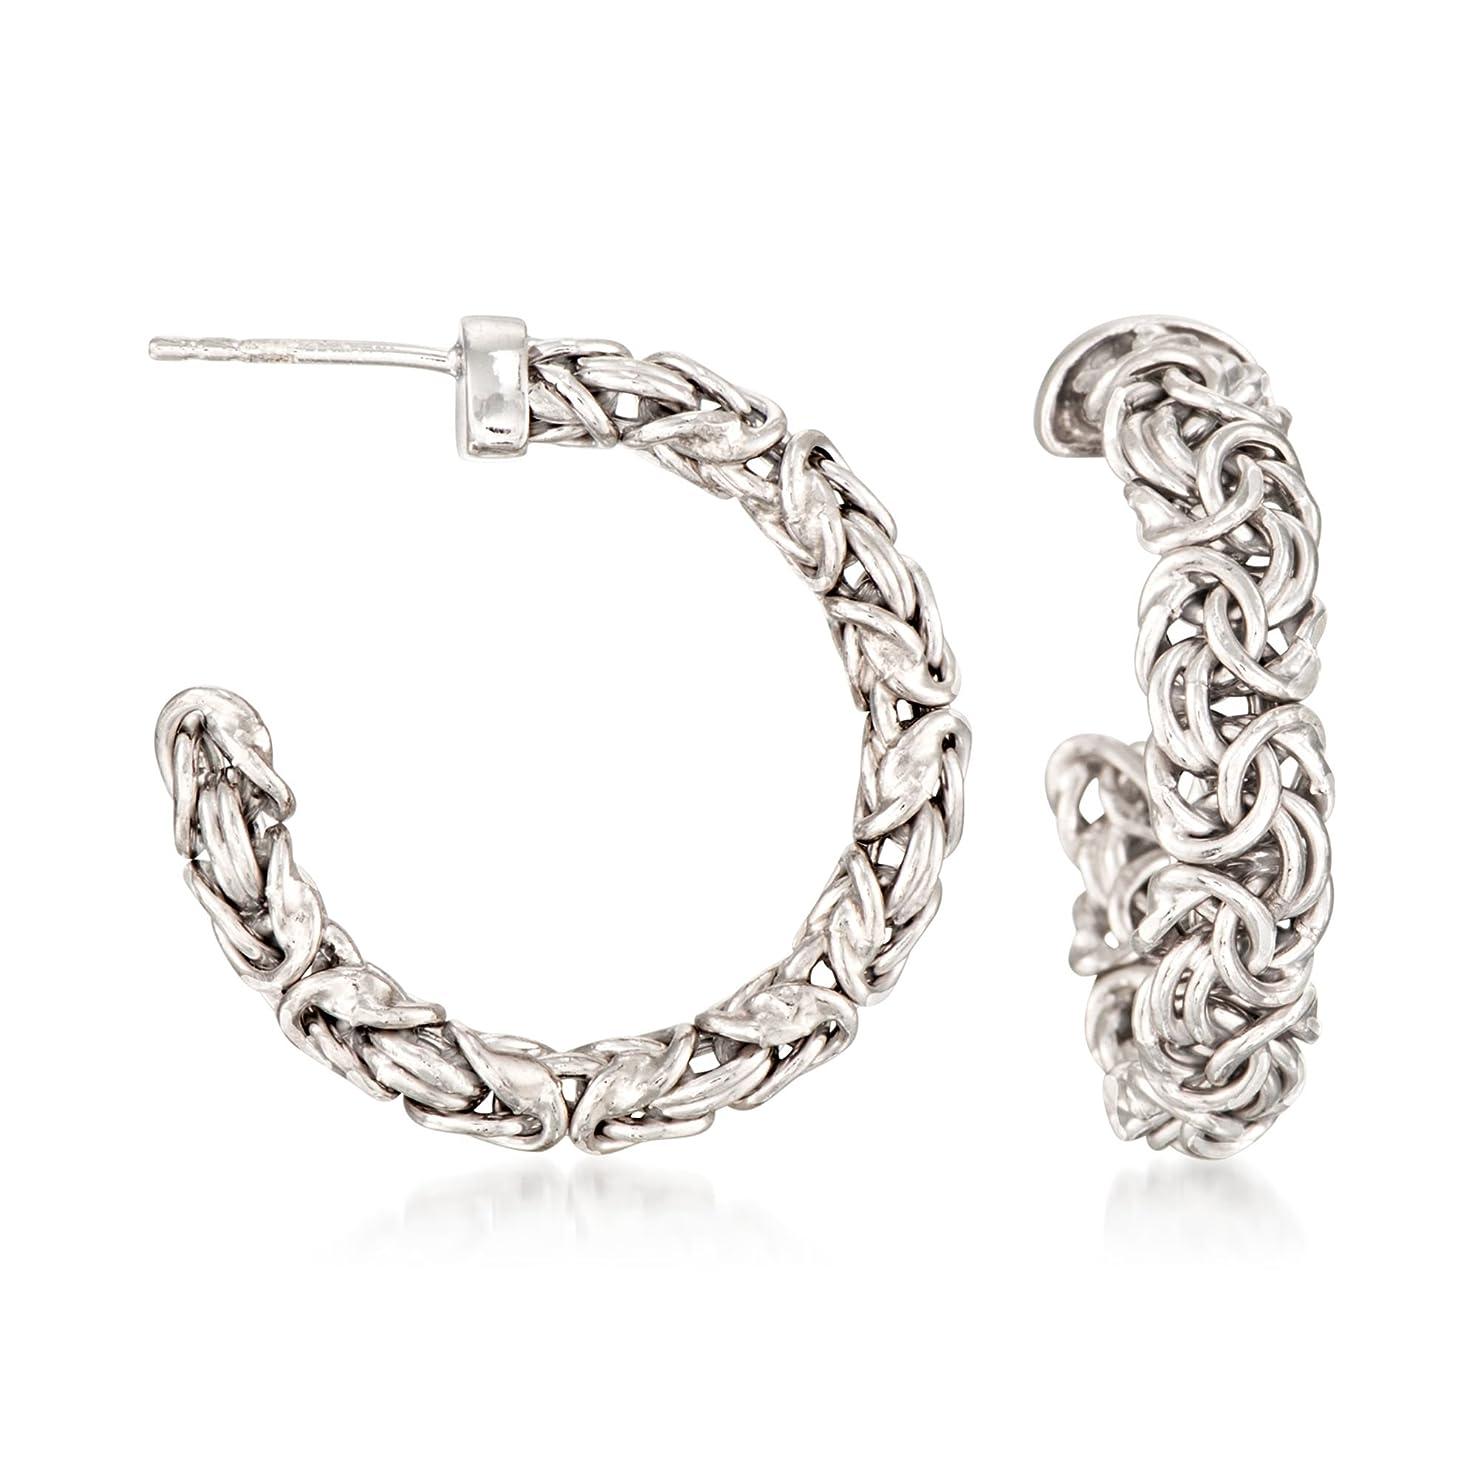 Ross-Simons Sterling Silver Byzantine Hoop Earrings